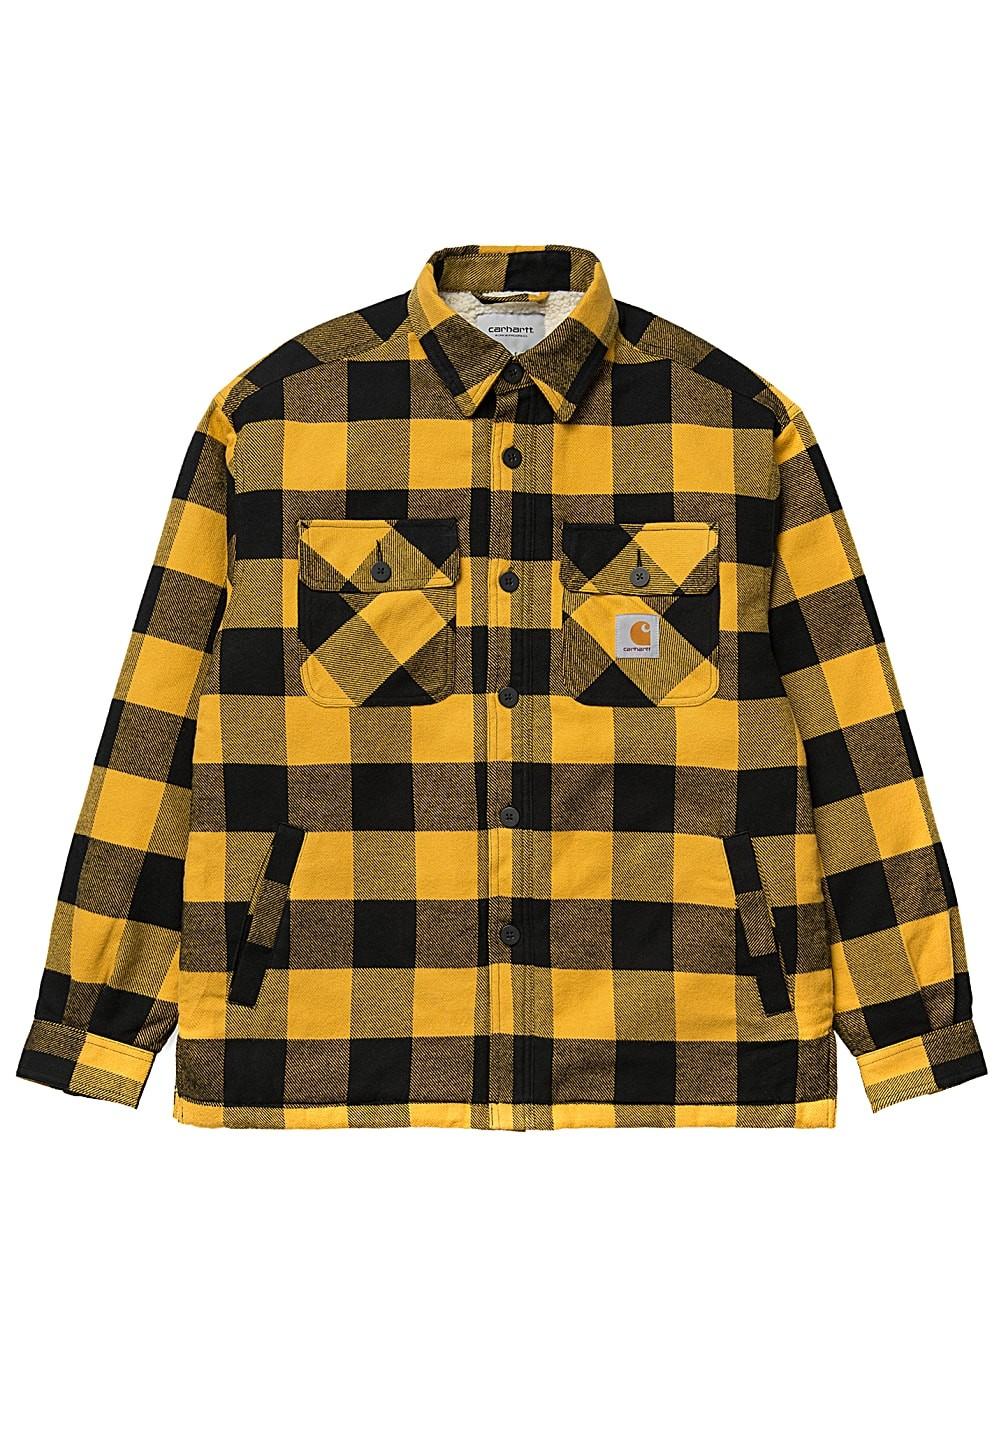 CARHARTT Herren Jacke Merton Shirt Jacket Merton Check / Colza